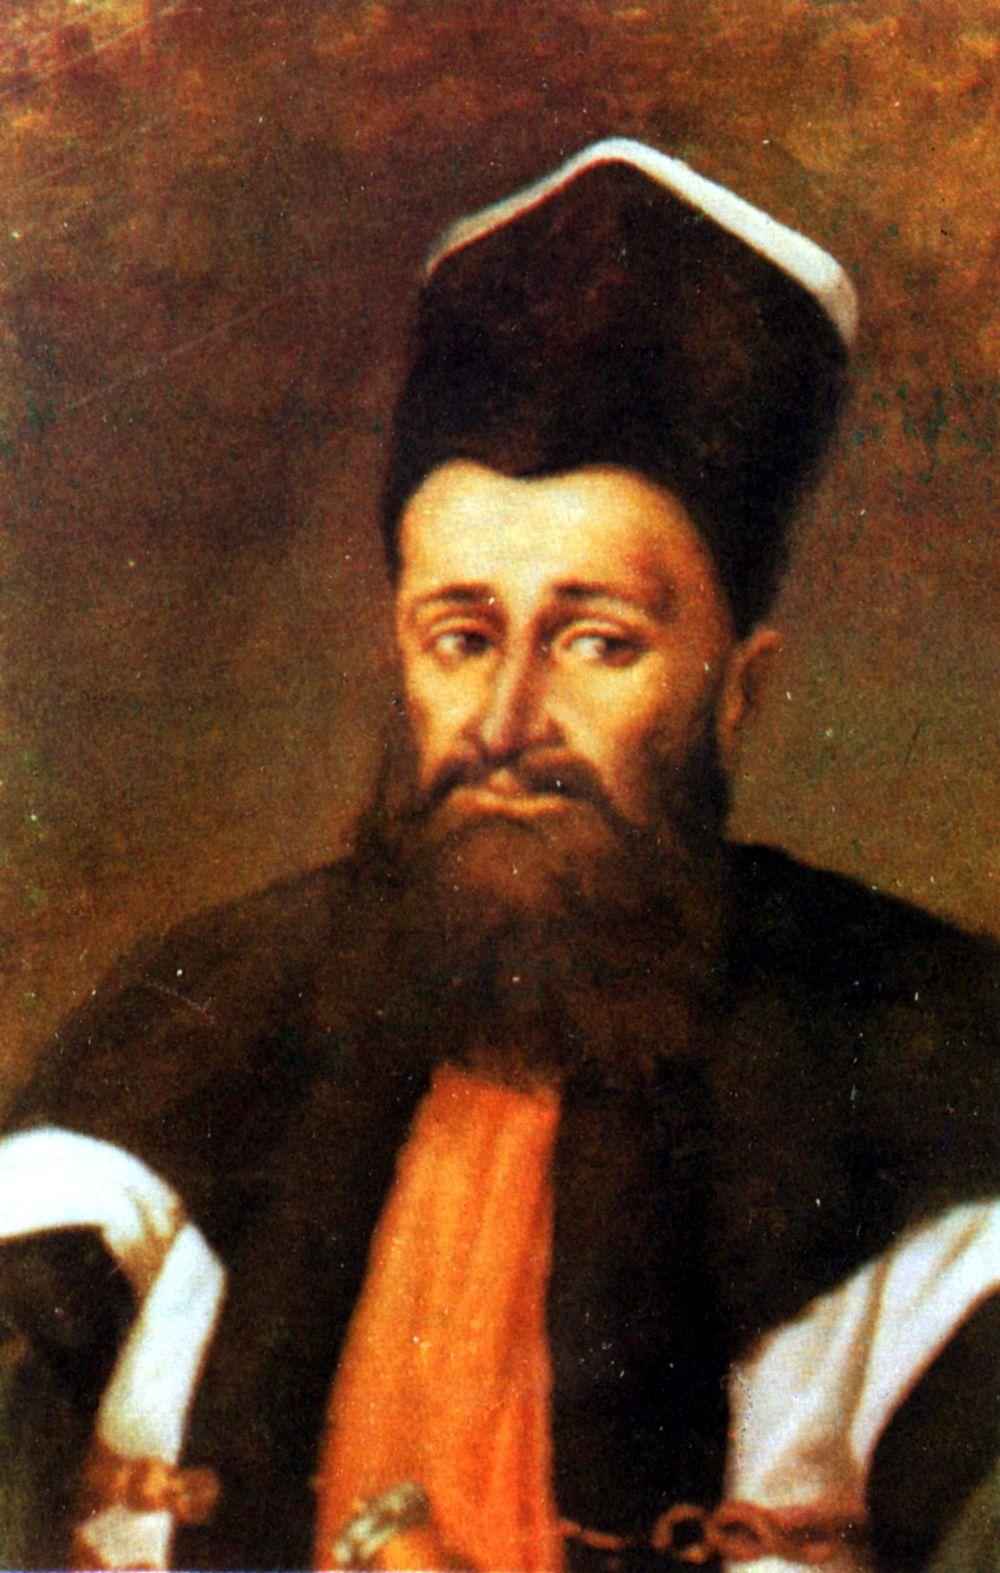 https://upload.wikimedia.org/wikipedia/commons/c/ce/Nicolae_Mavrogheni.jpg